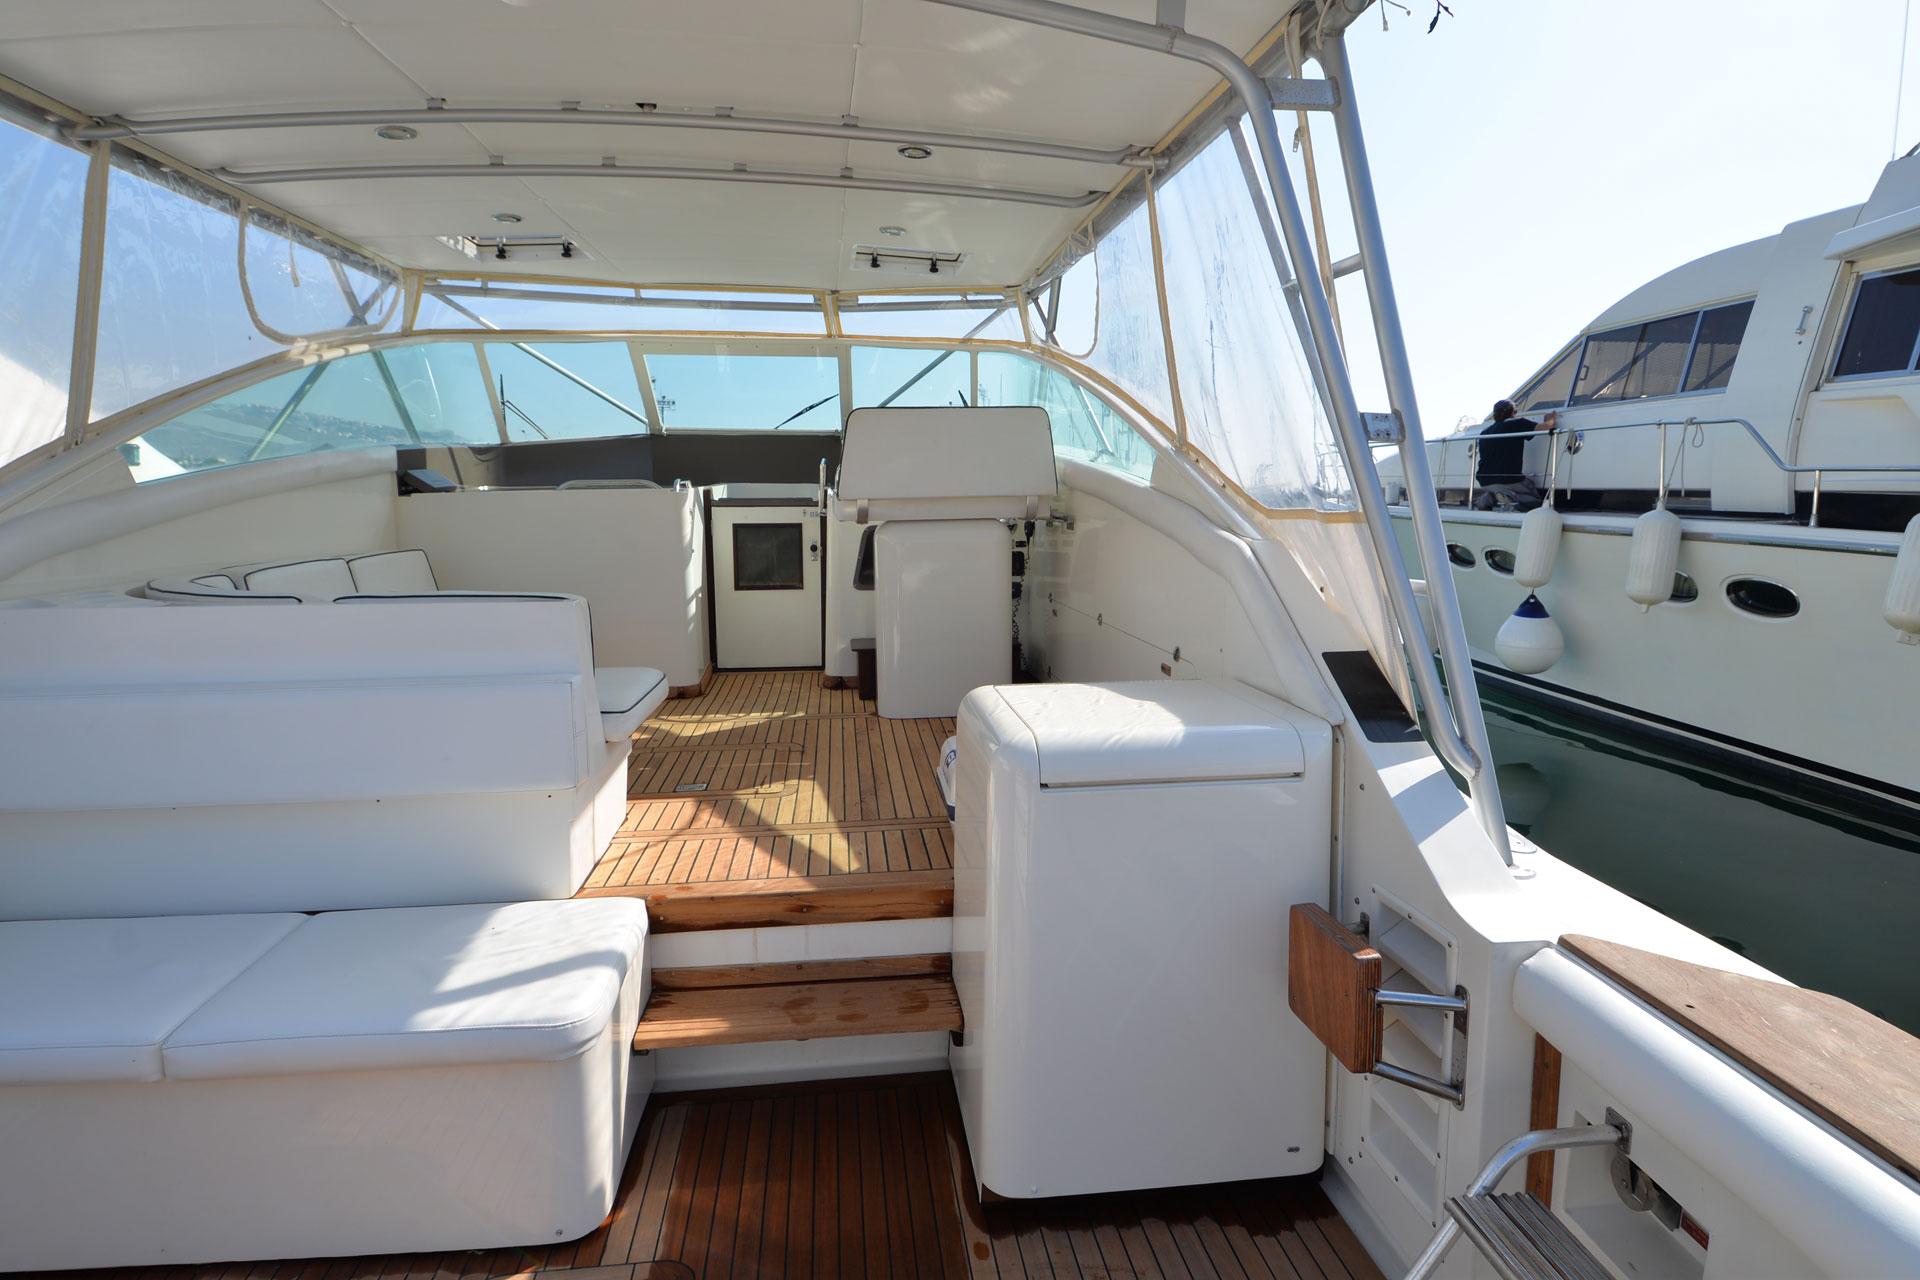 Santo-Maritime-Yachting-Bertram-Inside-Image1